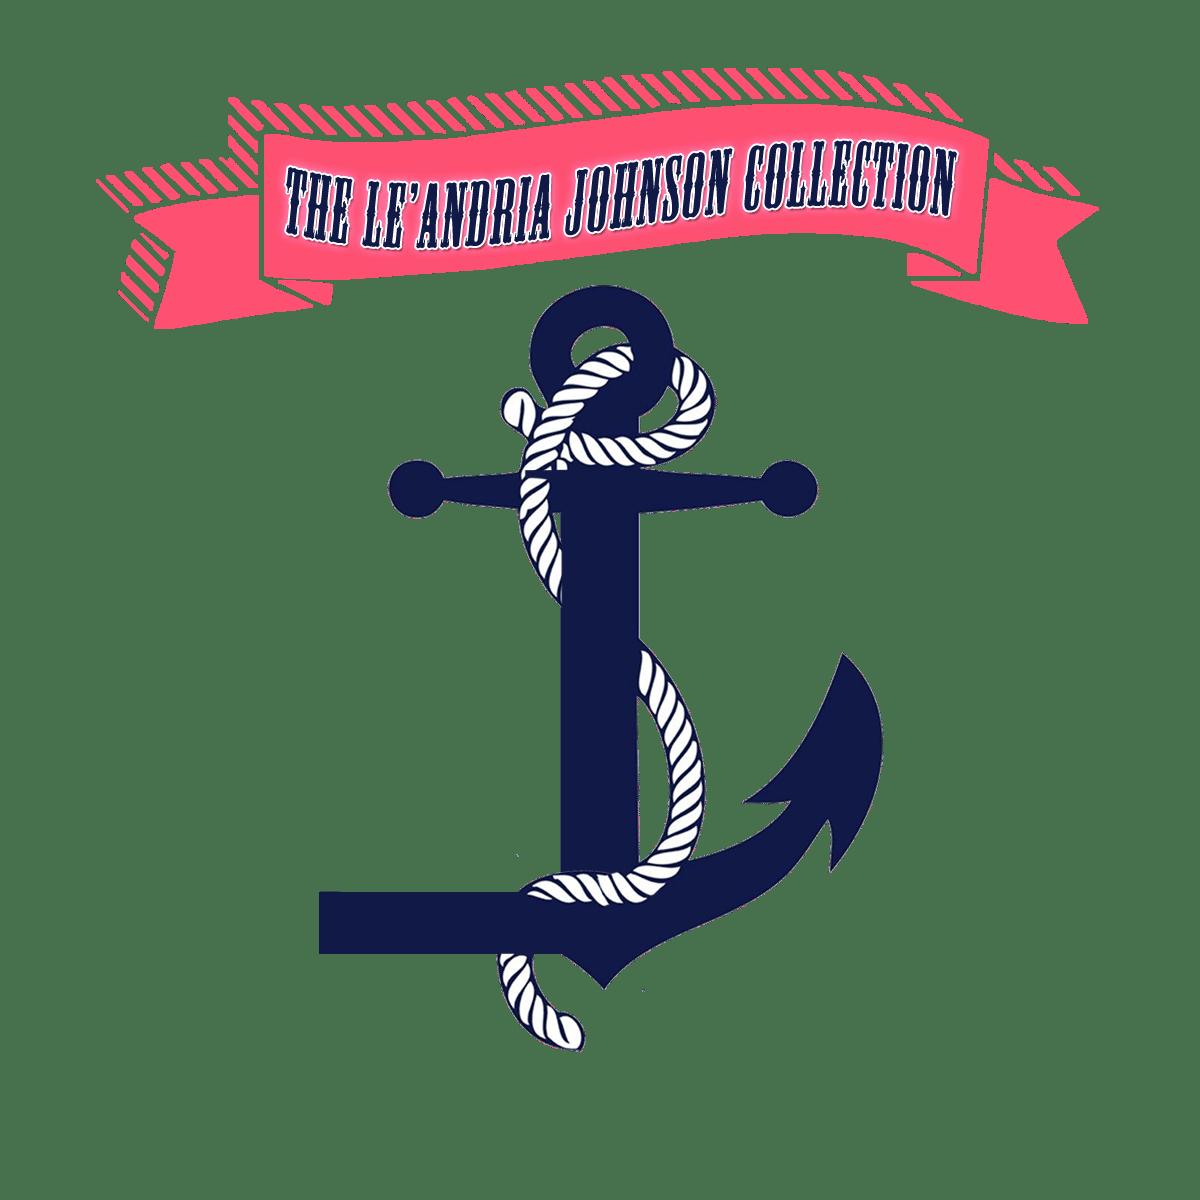 The Leandria Johnson Collection